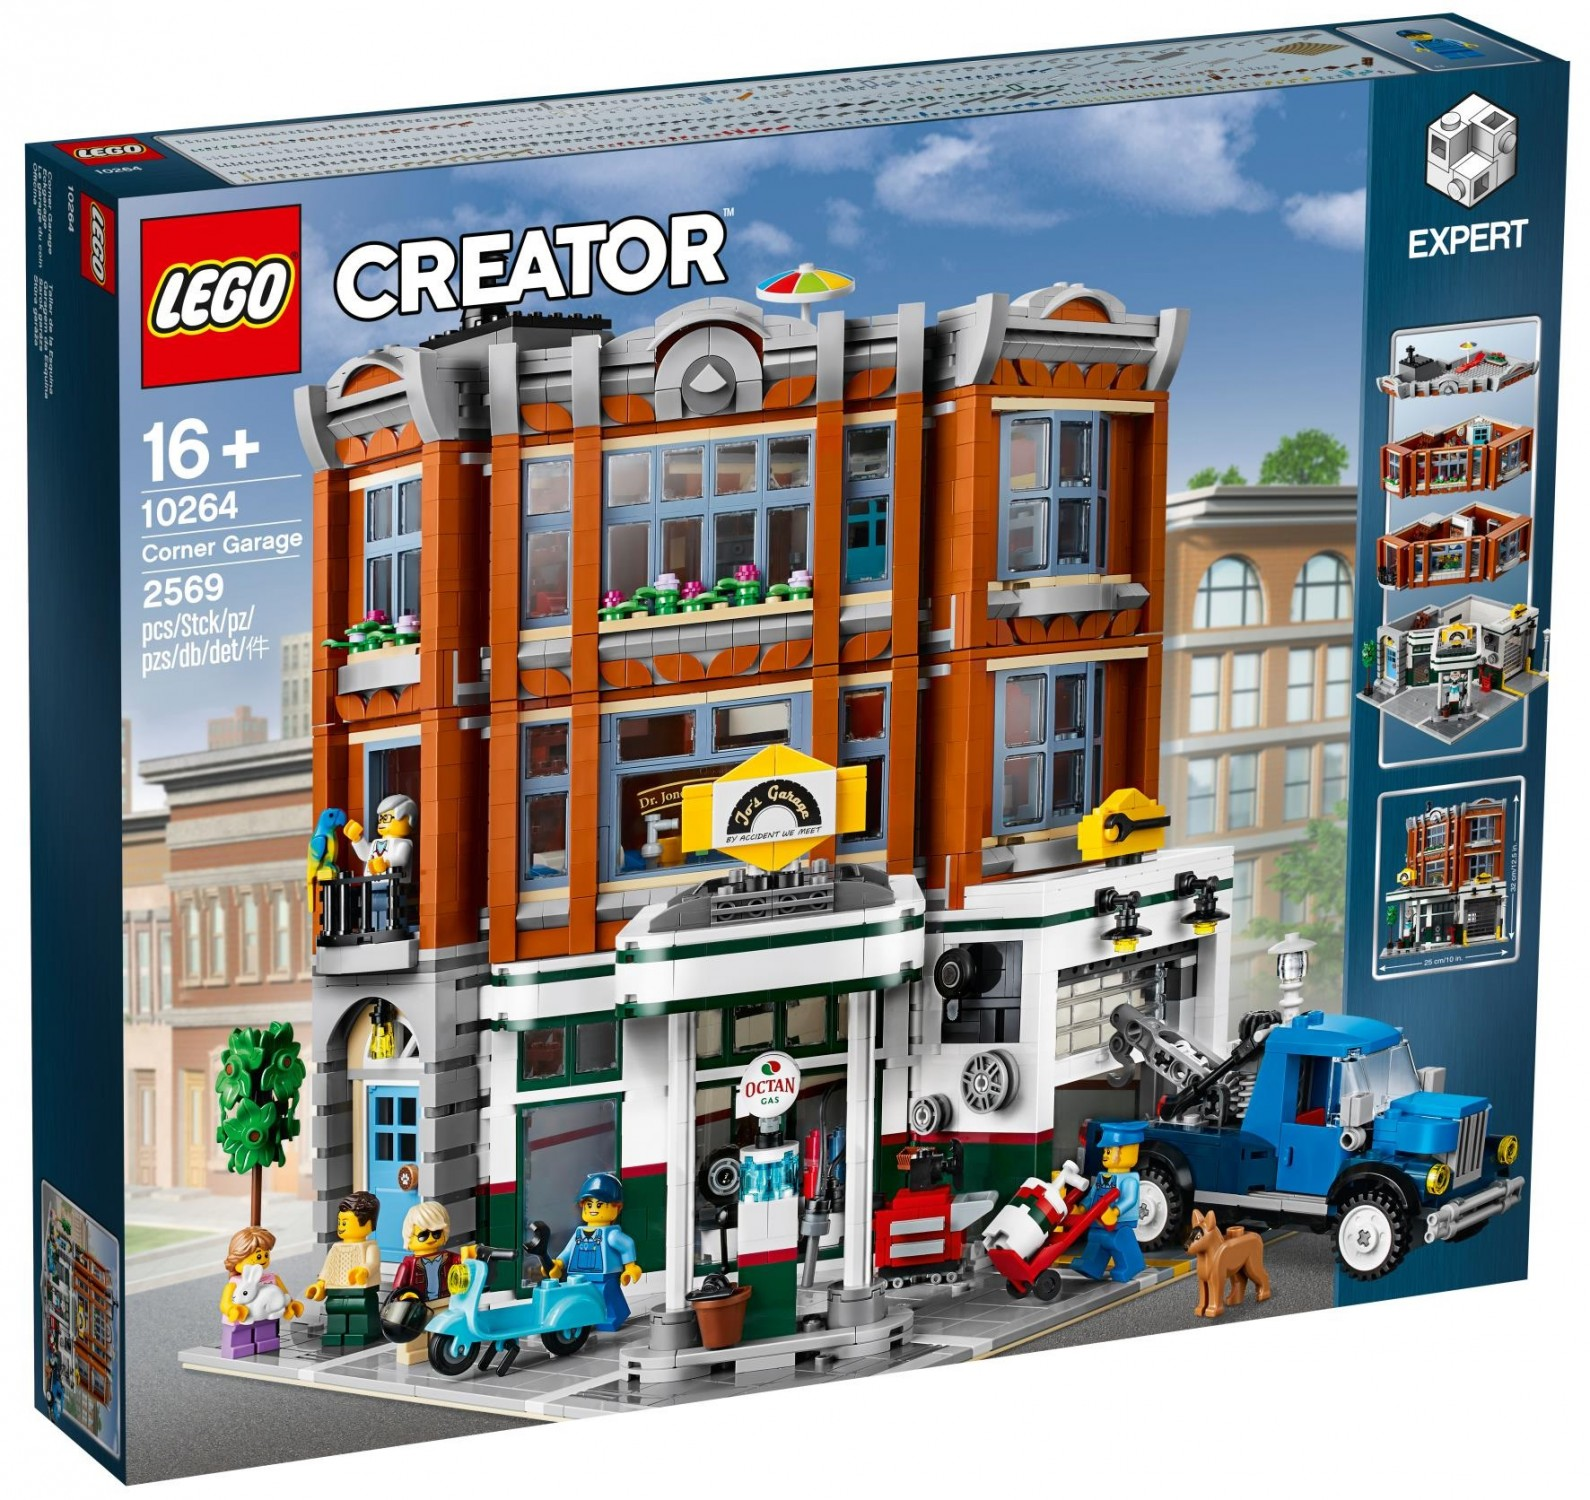 Lego Creator Exclusive 10264 Warsztat Na Rogu Super Oferty Na Klocki